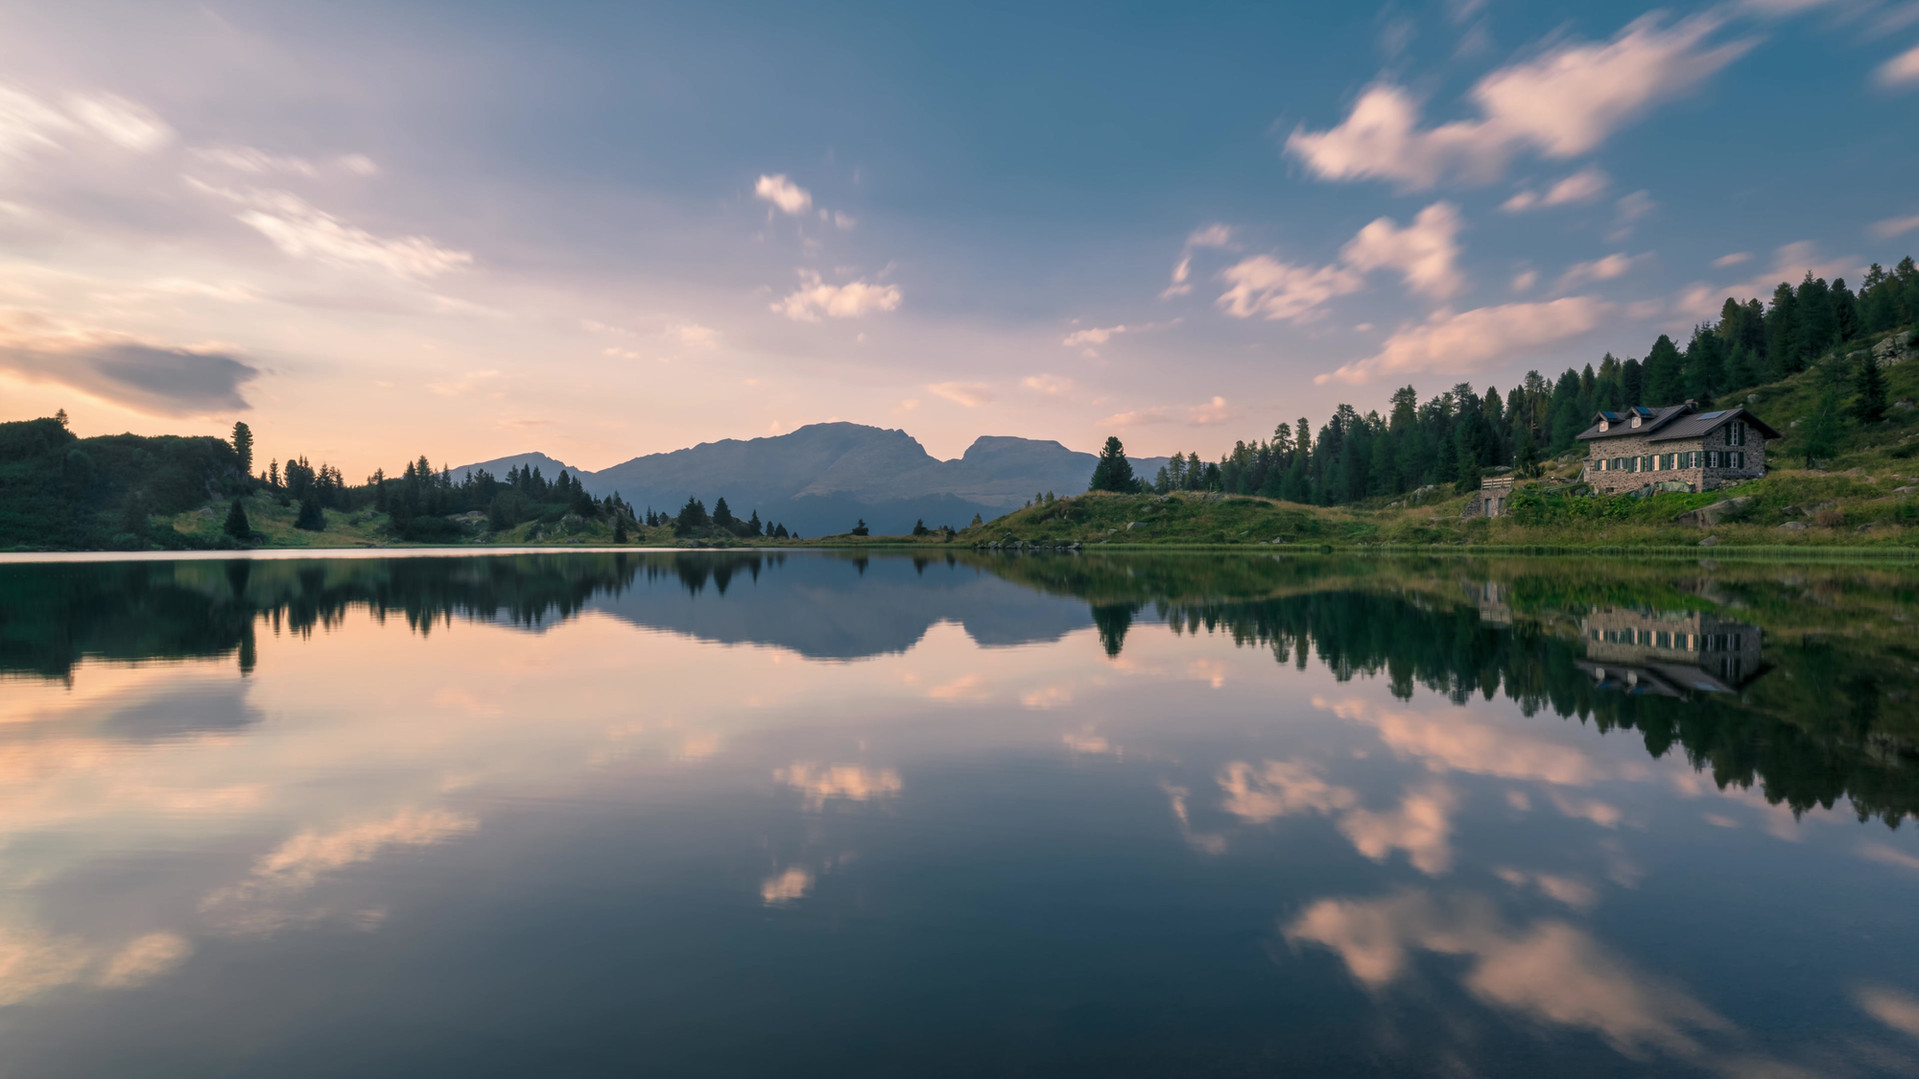 Time lapse tramonto lago colbricon.mp4